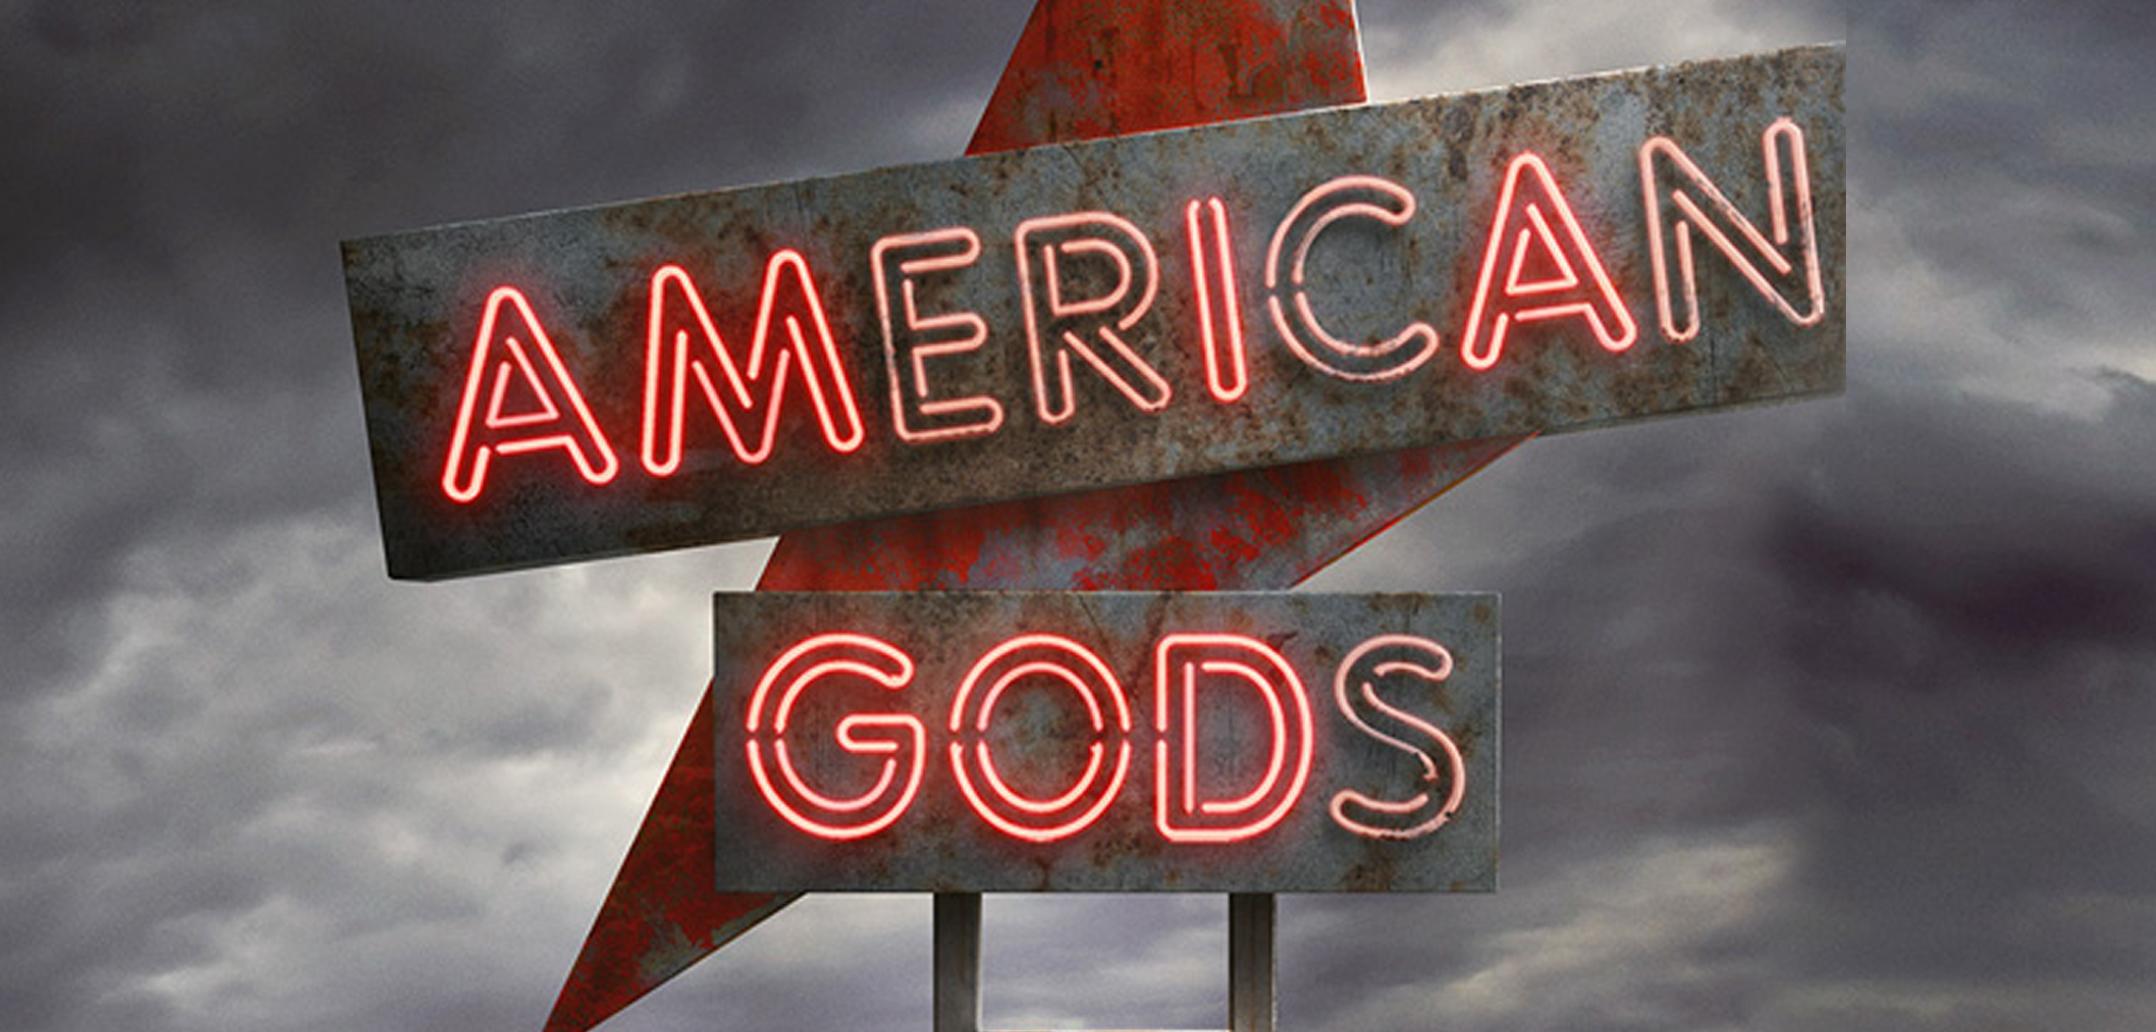 CRÍTICA A LA SERIE AMERICAN GODS